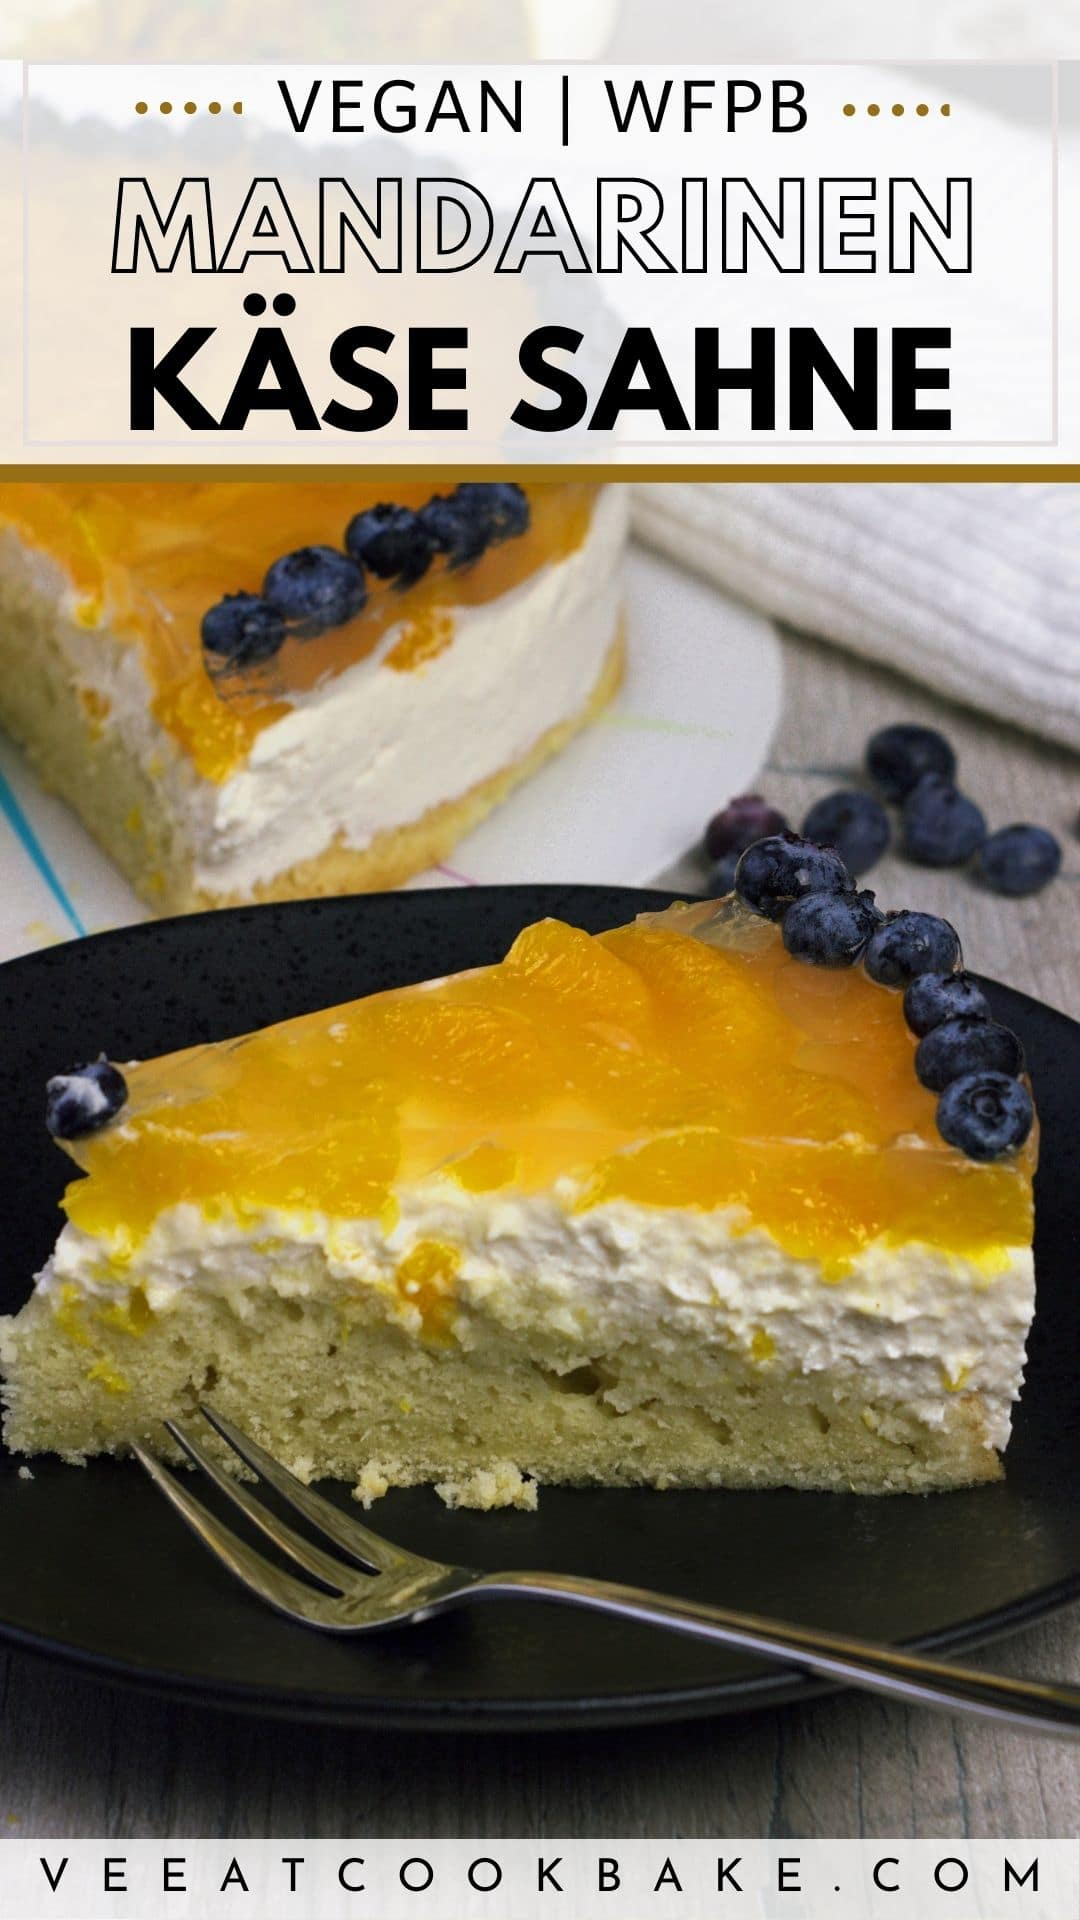 Mandarinen Käse Sahne Torte Pin für Pinterest